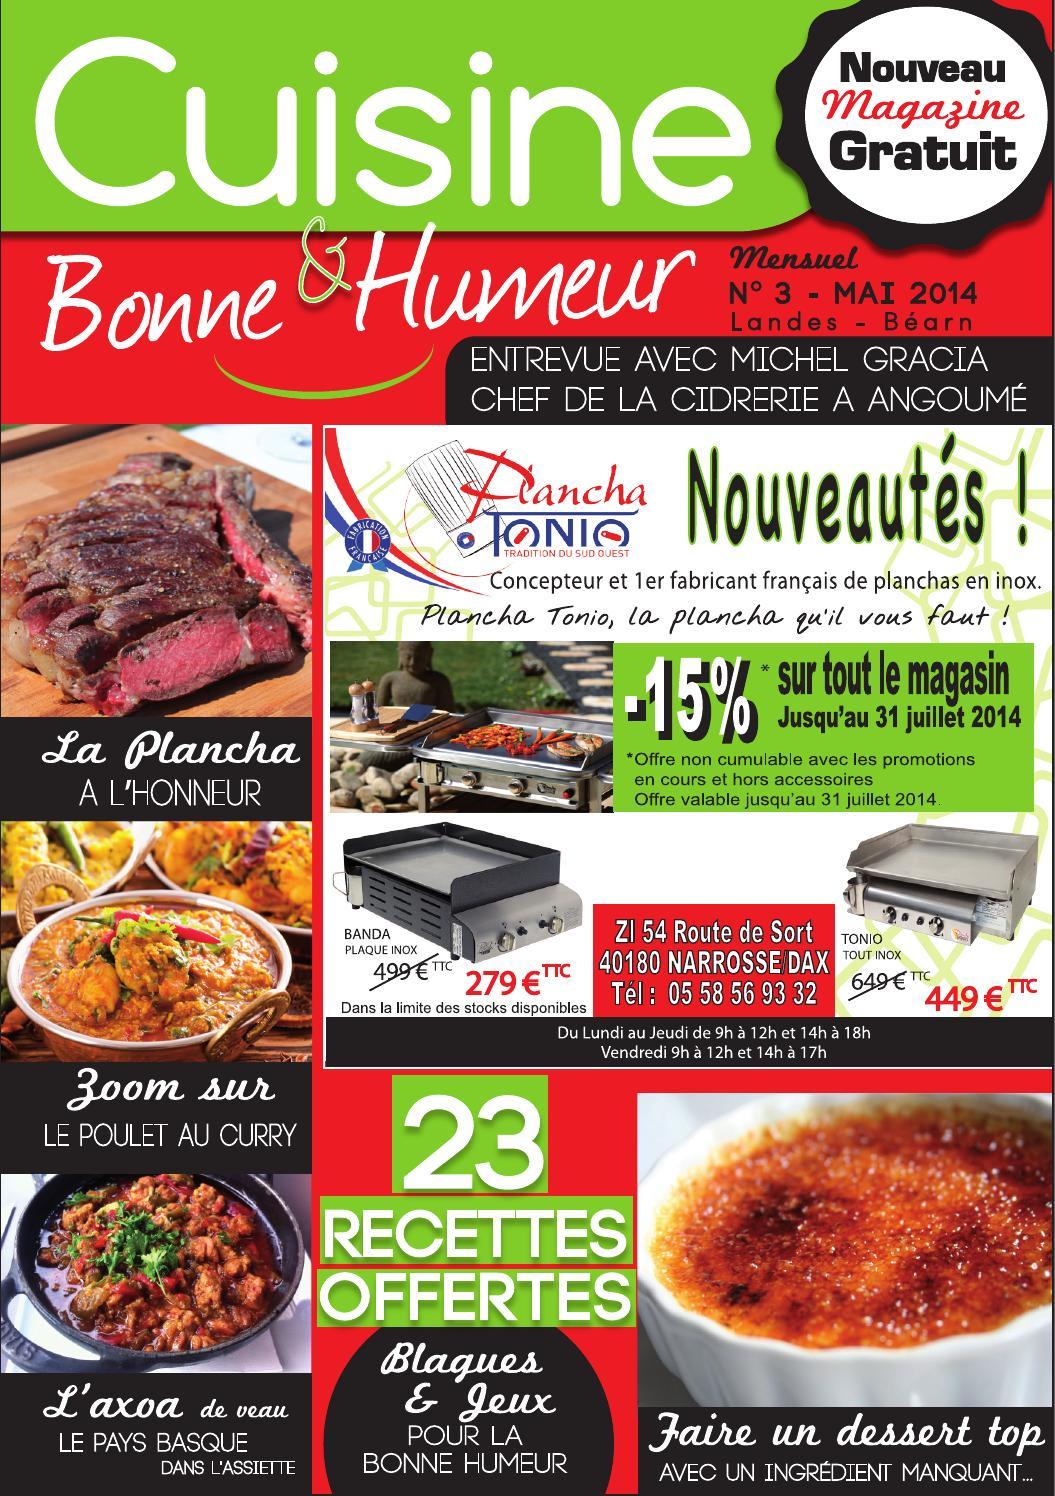 Cuisine Bonne Humeur Edition 3 Mai 2014 By Suzanne George Issuu